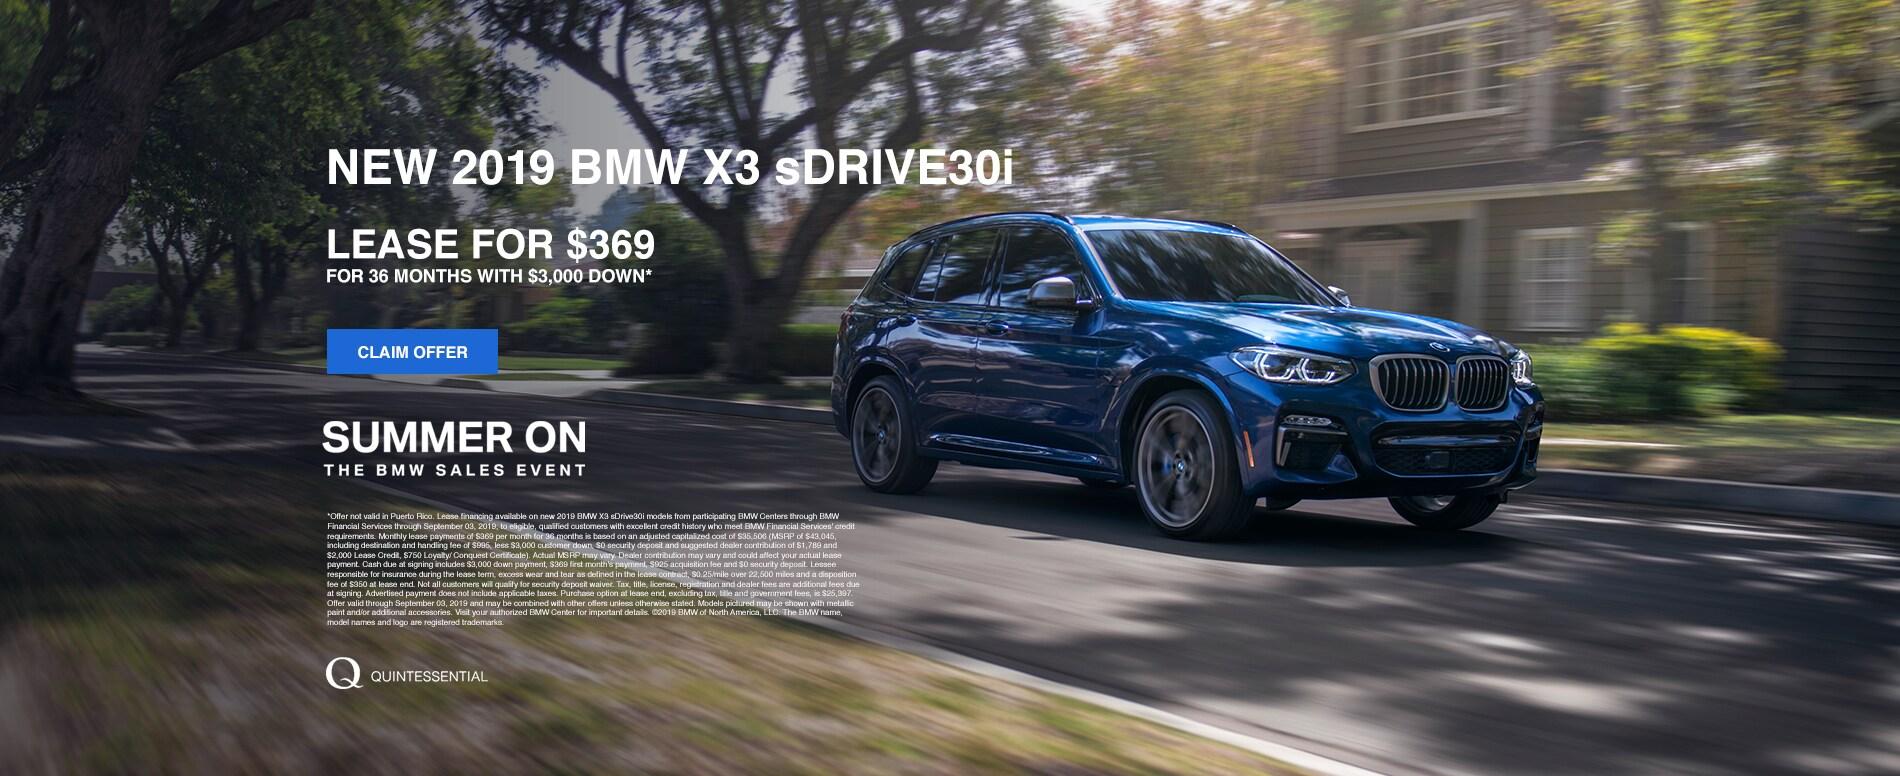 Braman BMW   BMW Dealership in Miami, FL   New & Used BMW Dealer